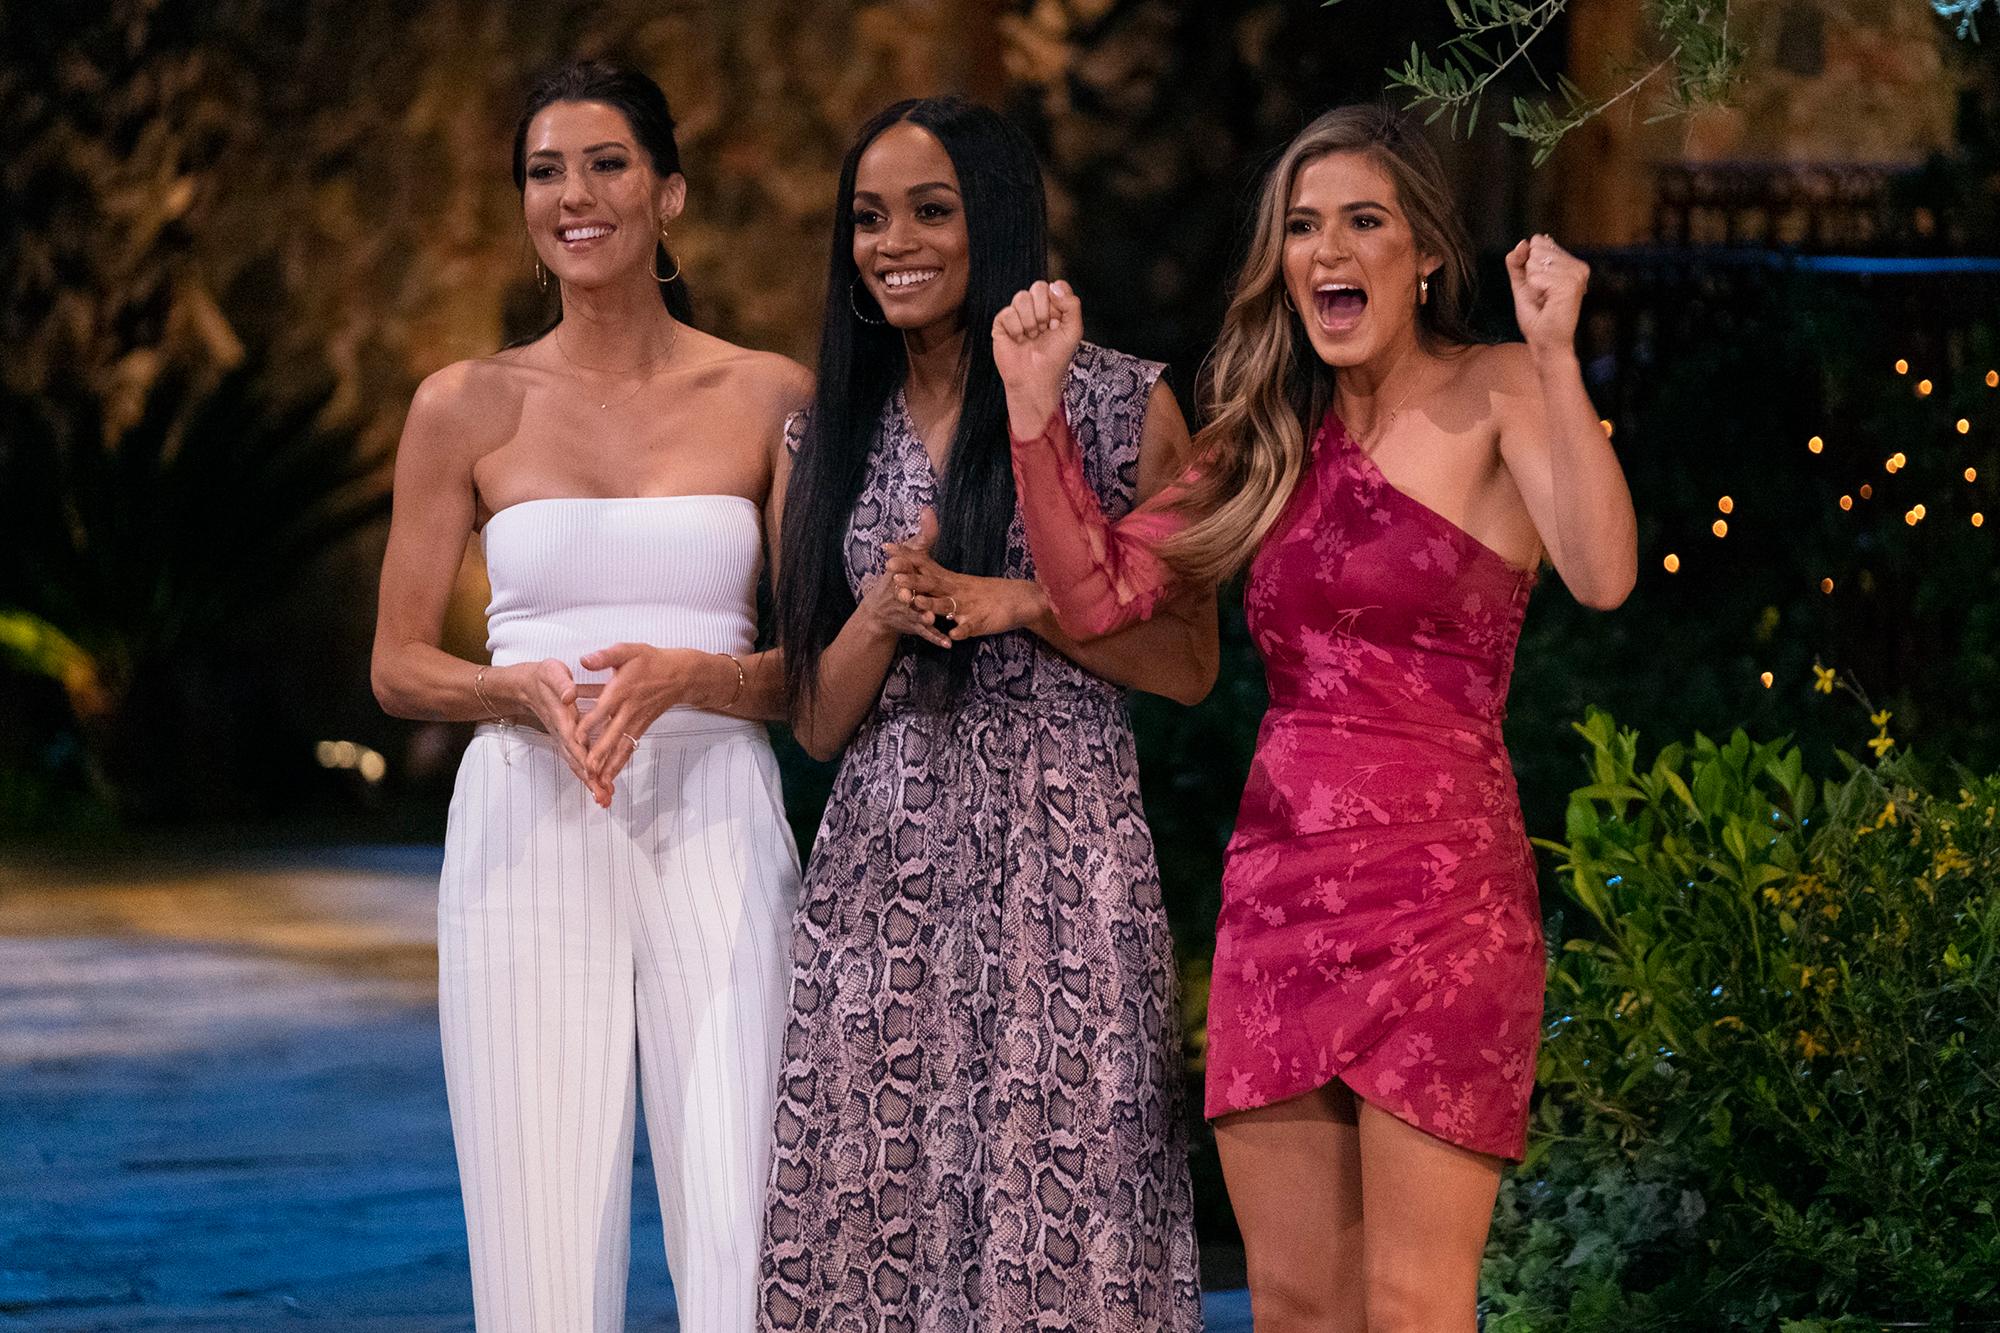 Bachelorette Reunion Made Rachel Lindsay 'Sad' - Becca Kufrin, Rachel Lindsay and Joelle Fletcher during ABC's Season 15 reunion of 'The Bachelorette.'